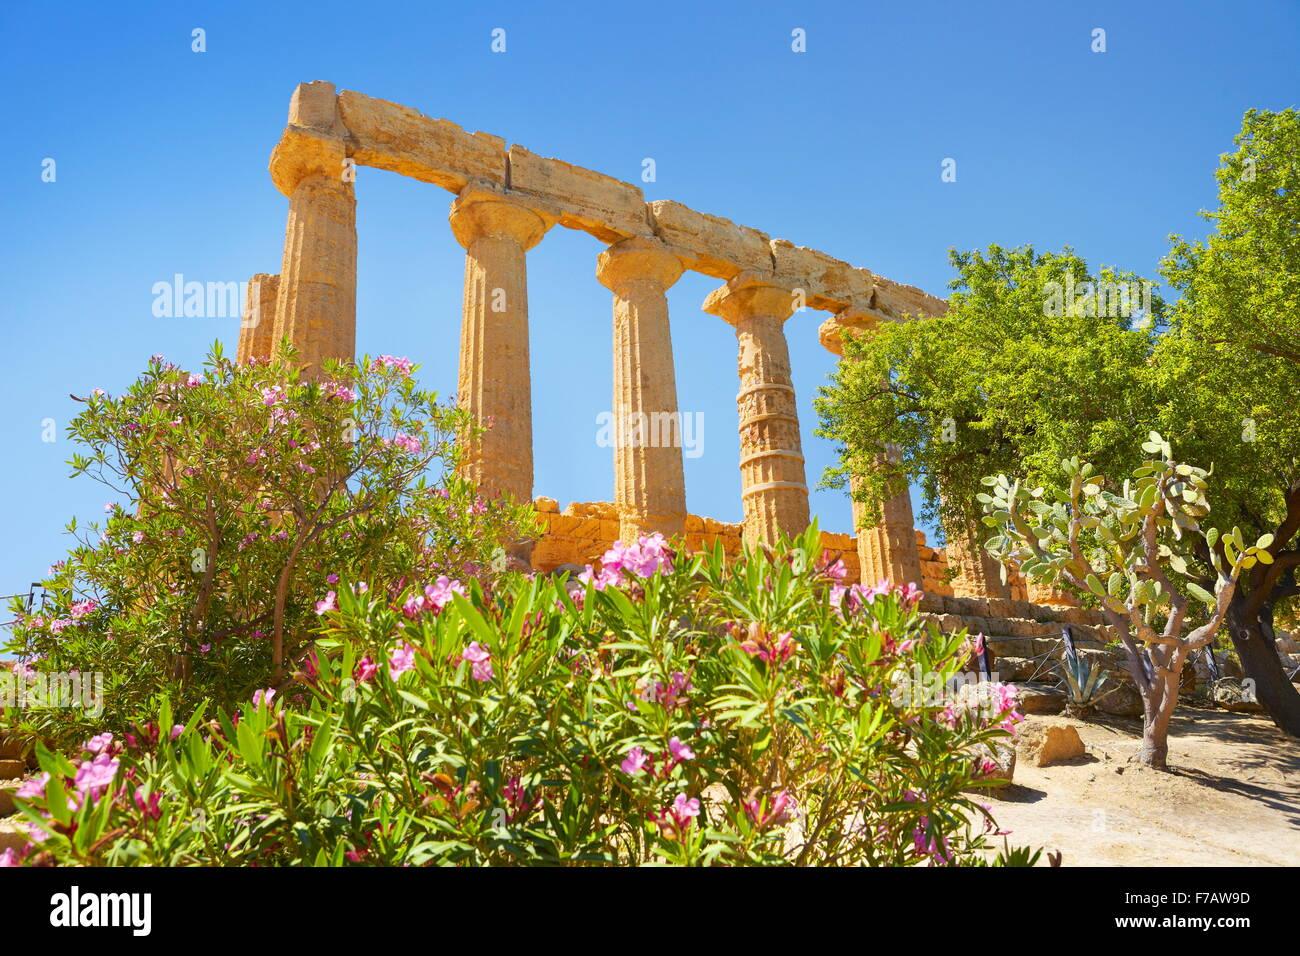 Tempel der Hera im Tal der Tempel (Valle dei Templi), Agrigento, Sizilien, Italien-UNESCO Stockbild